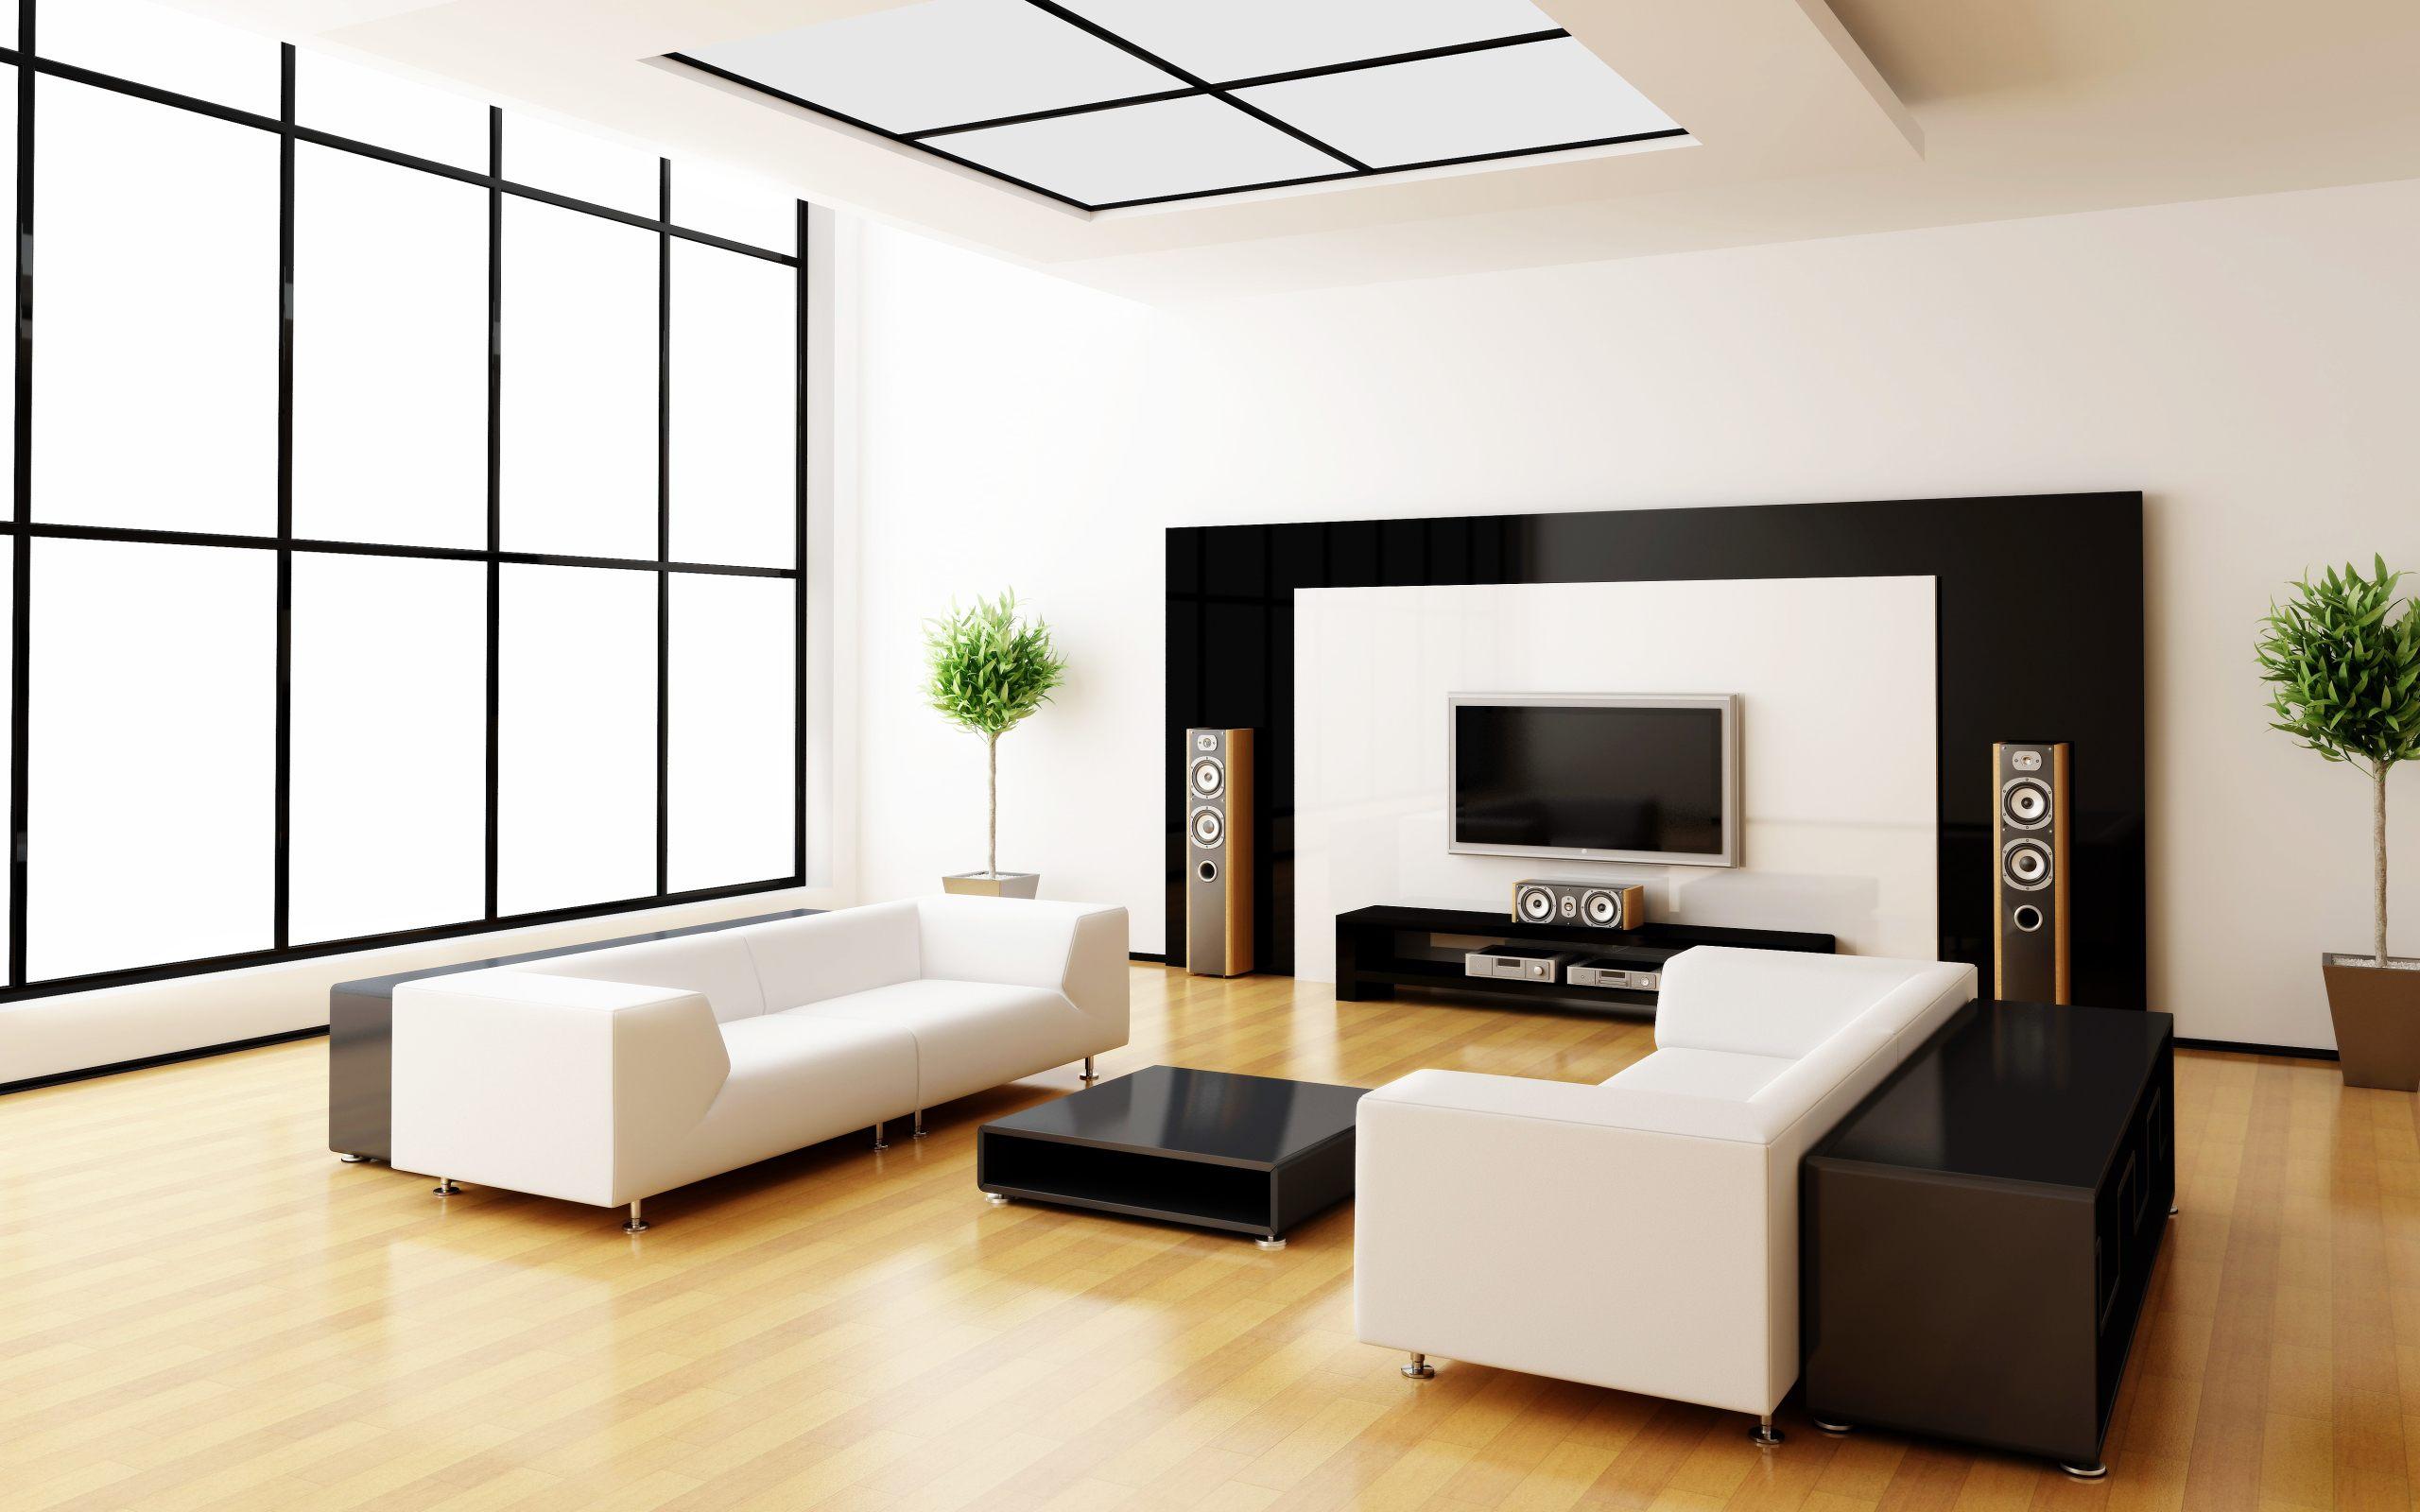 Hometheater Room Interior For Desktop Mobile Home Theater House Interior Design 2017 Hall 1288013 Hd Wallpaper Backgrounds Download